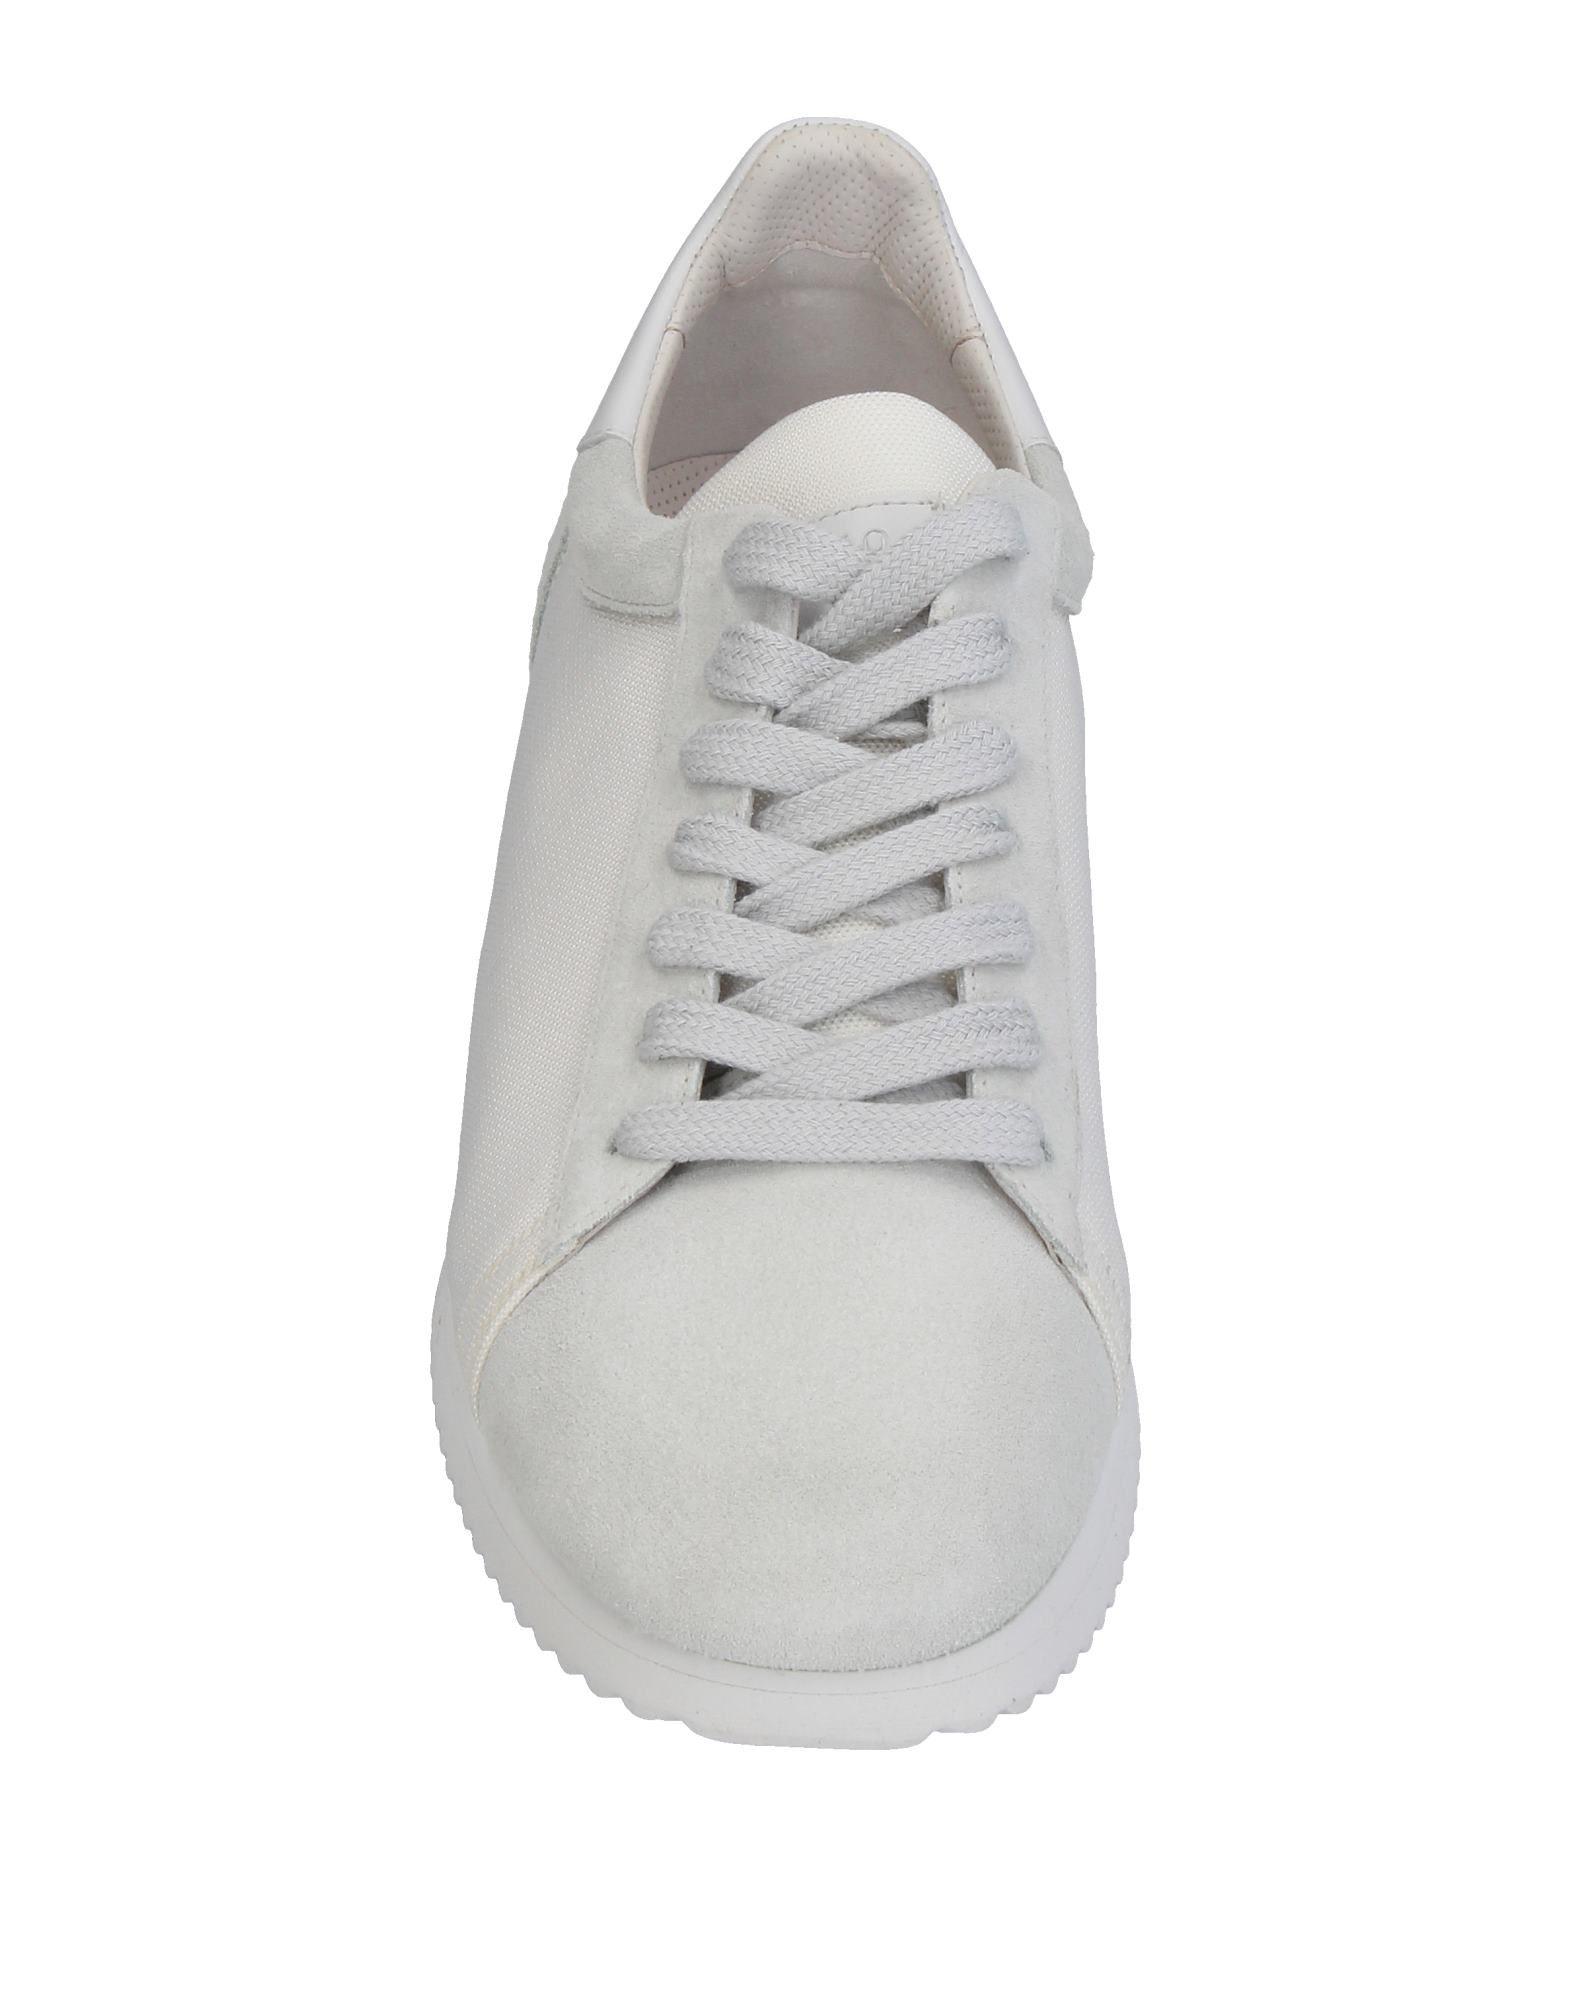 Brunello Cucinelli Sneakers Herren  11397146UA Gute Qualität beliebte Schuhe